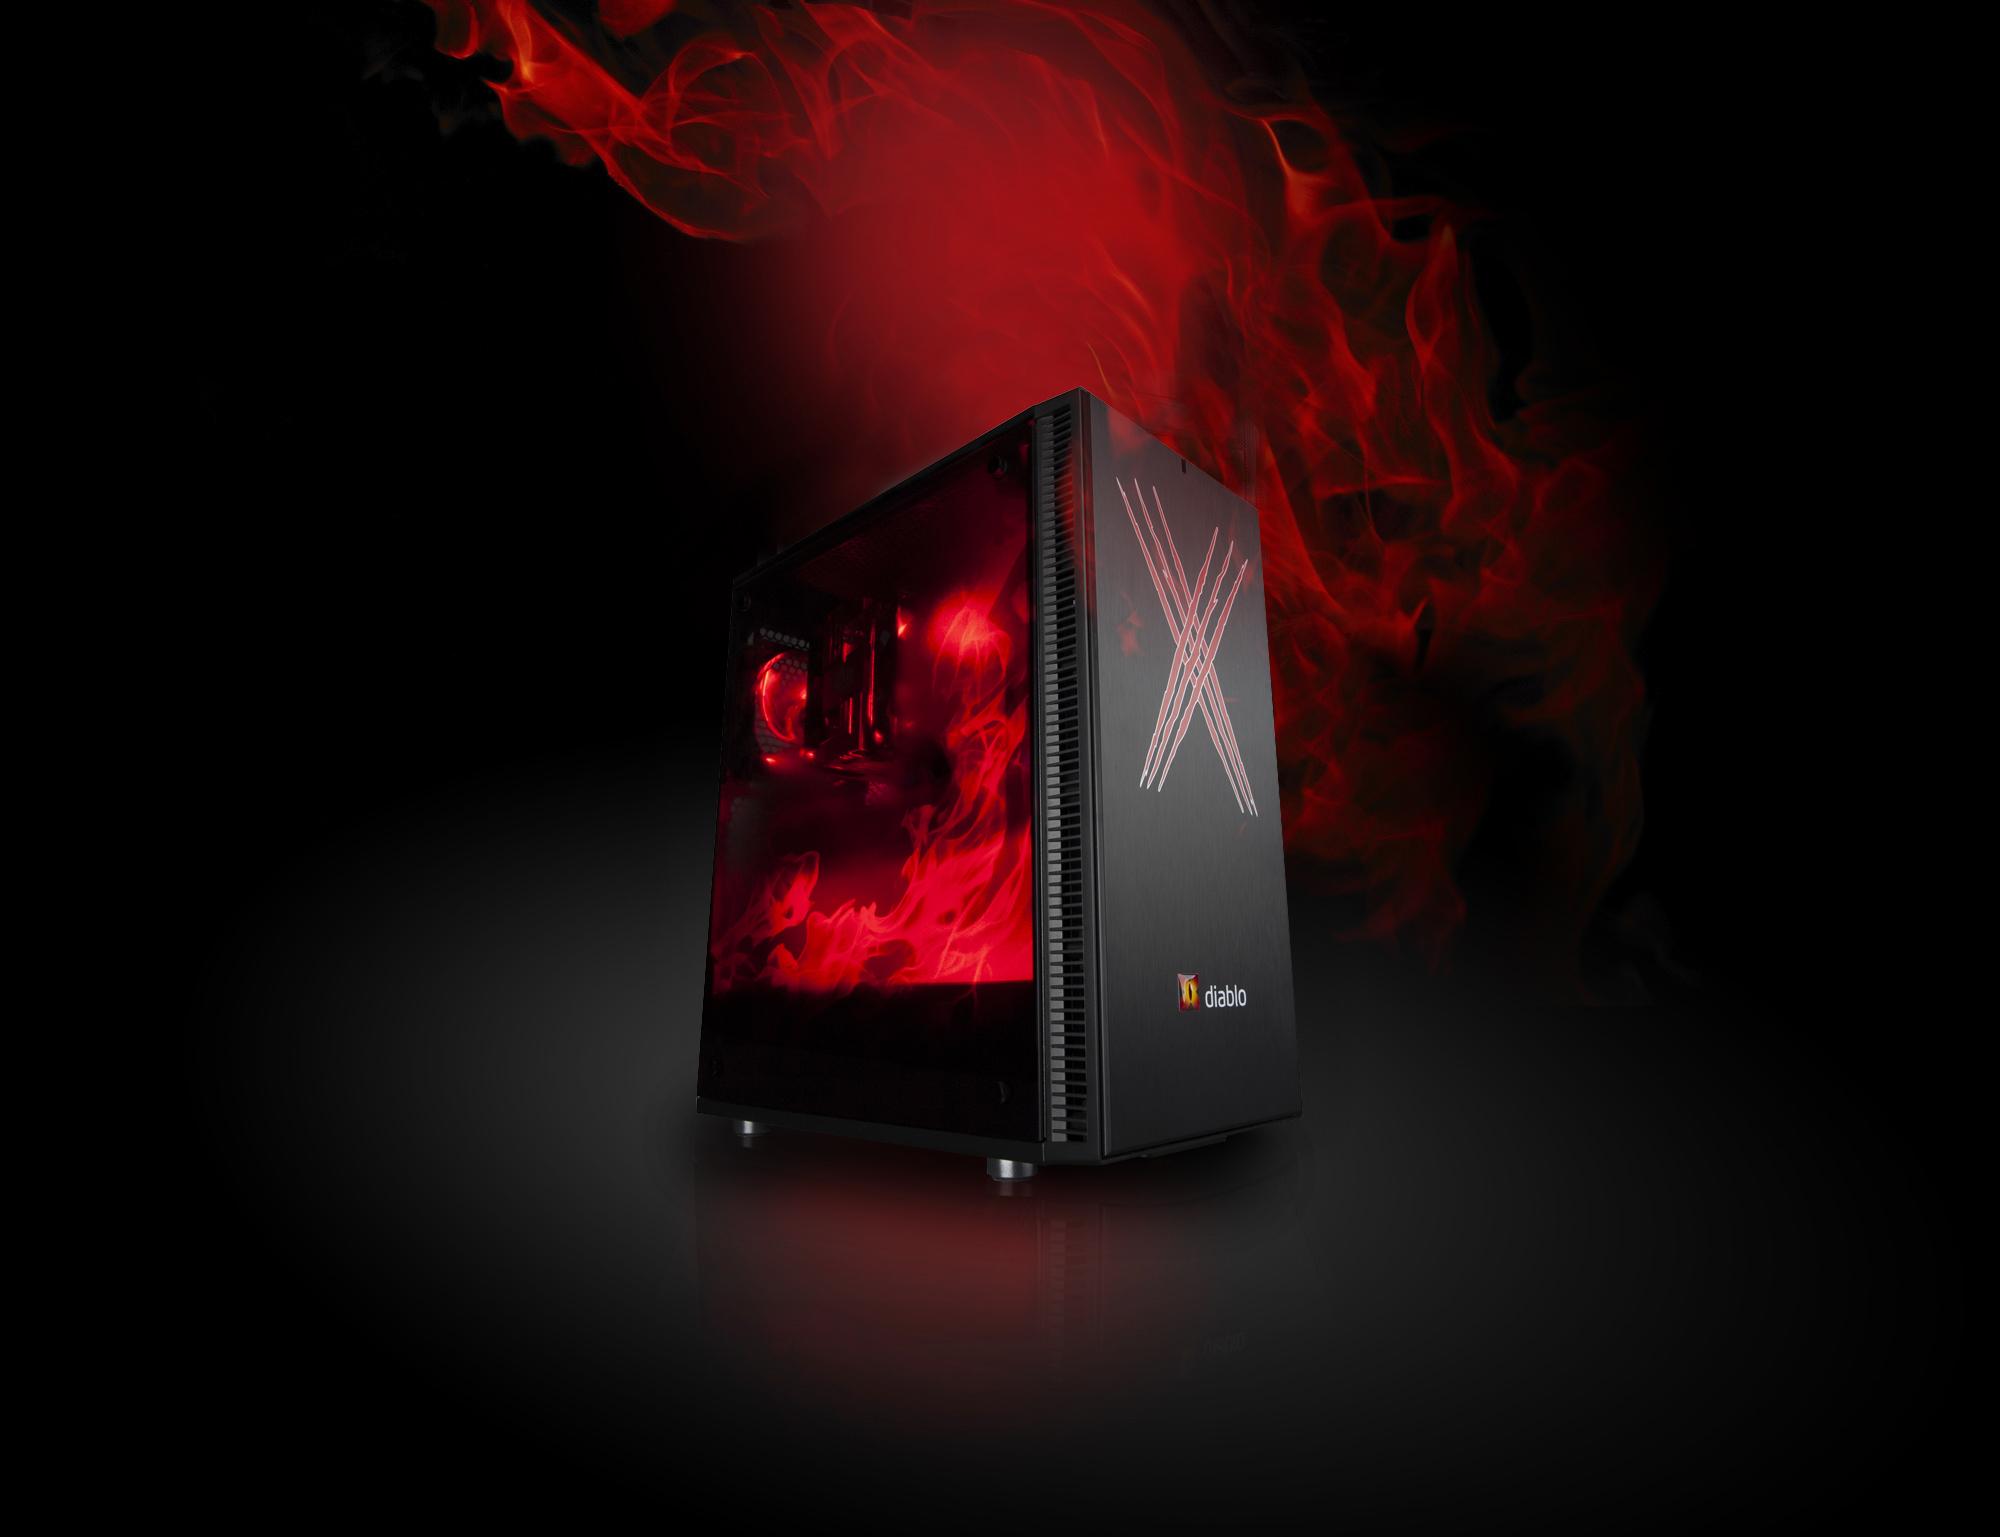 X-DIABLO Extreme X7K 3080 (i7-10700K/32GB/SSD 1000GB NVME/HDD 2TB/RTX3080/W10/LED) - 11554602